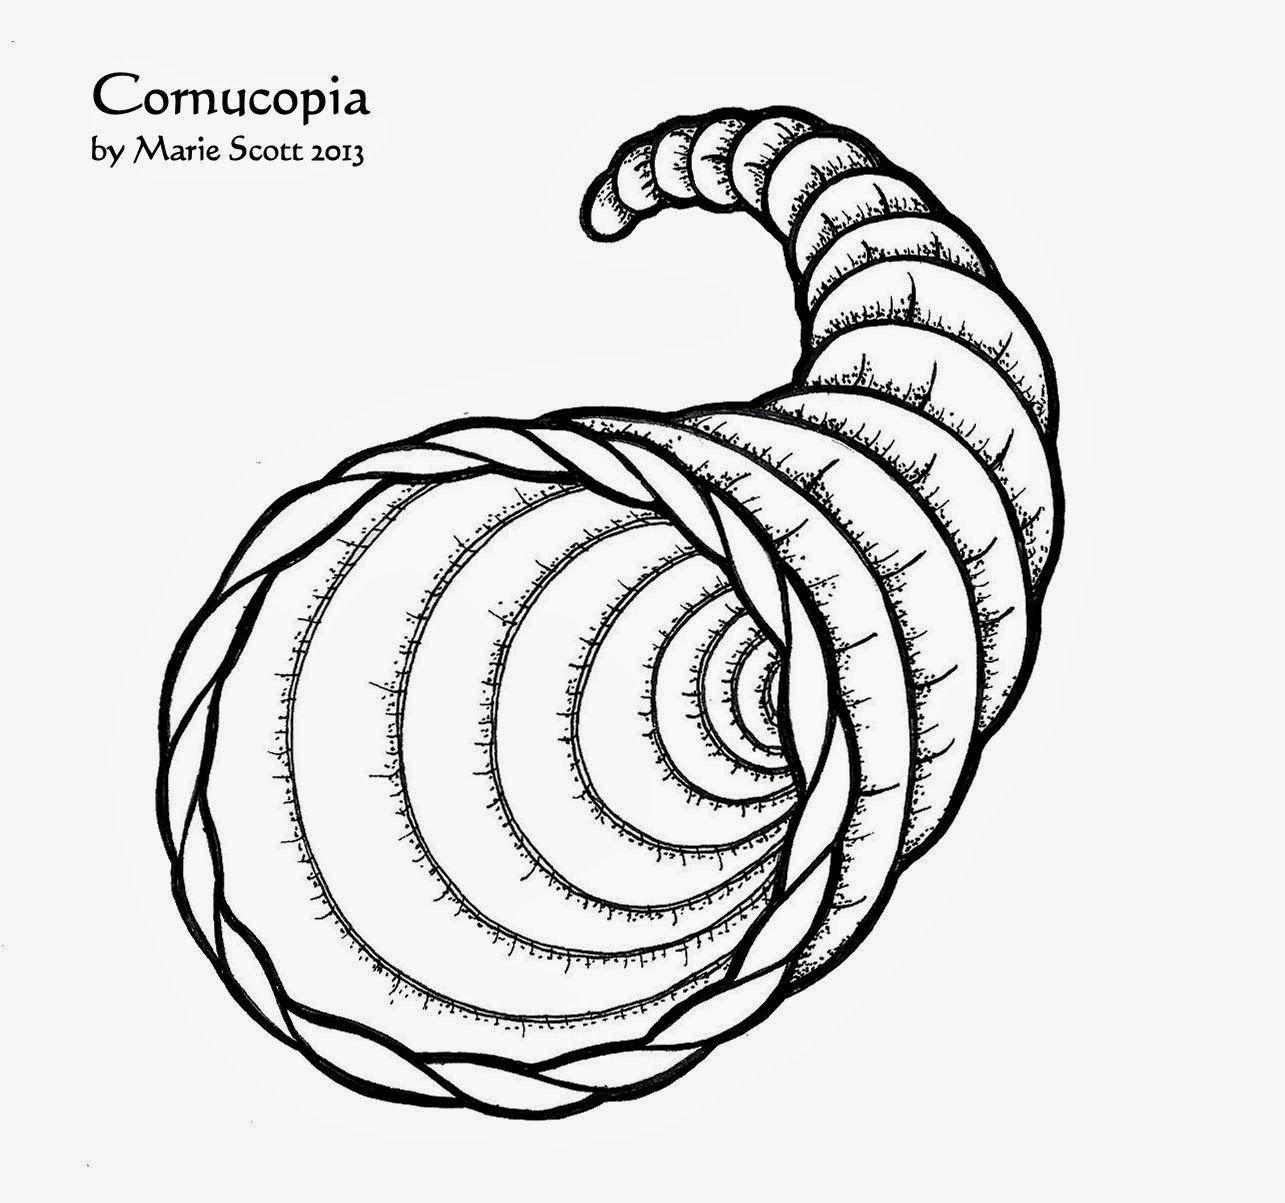 Cornucopia Coloring Sheet